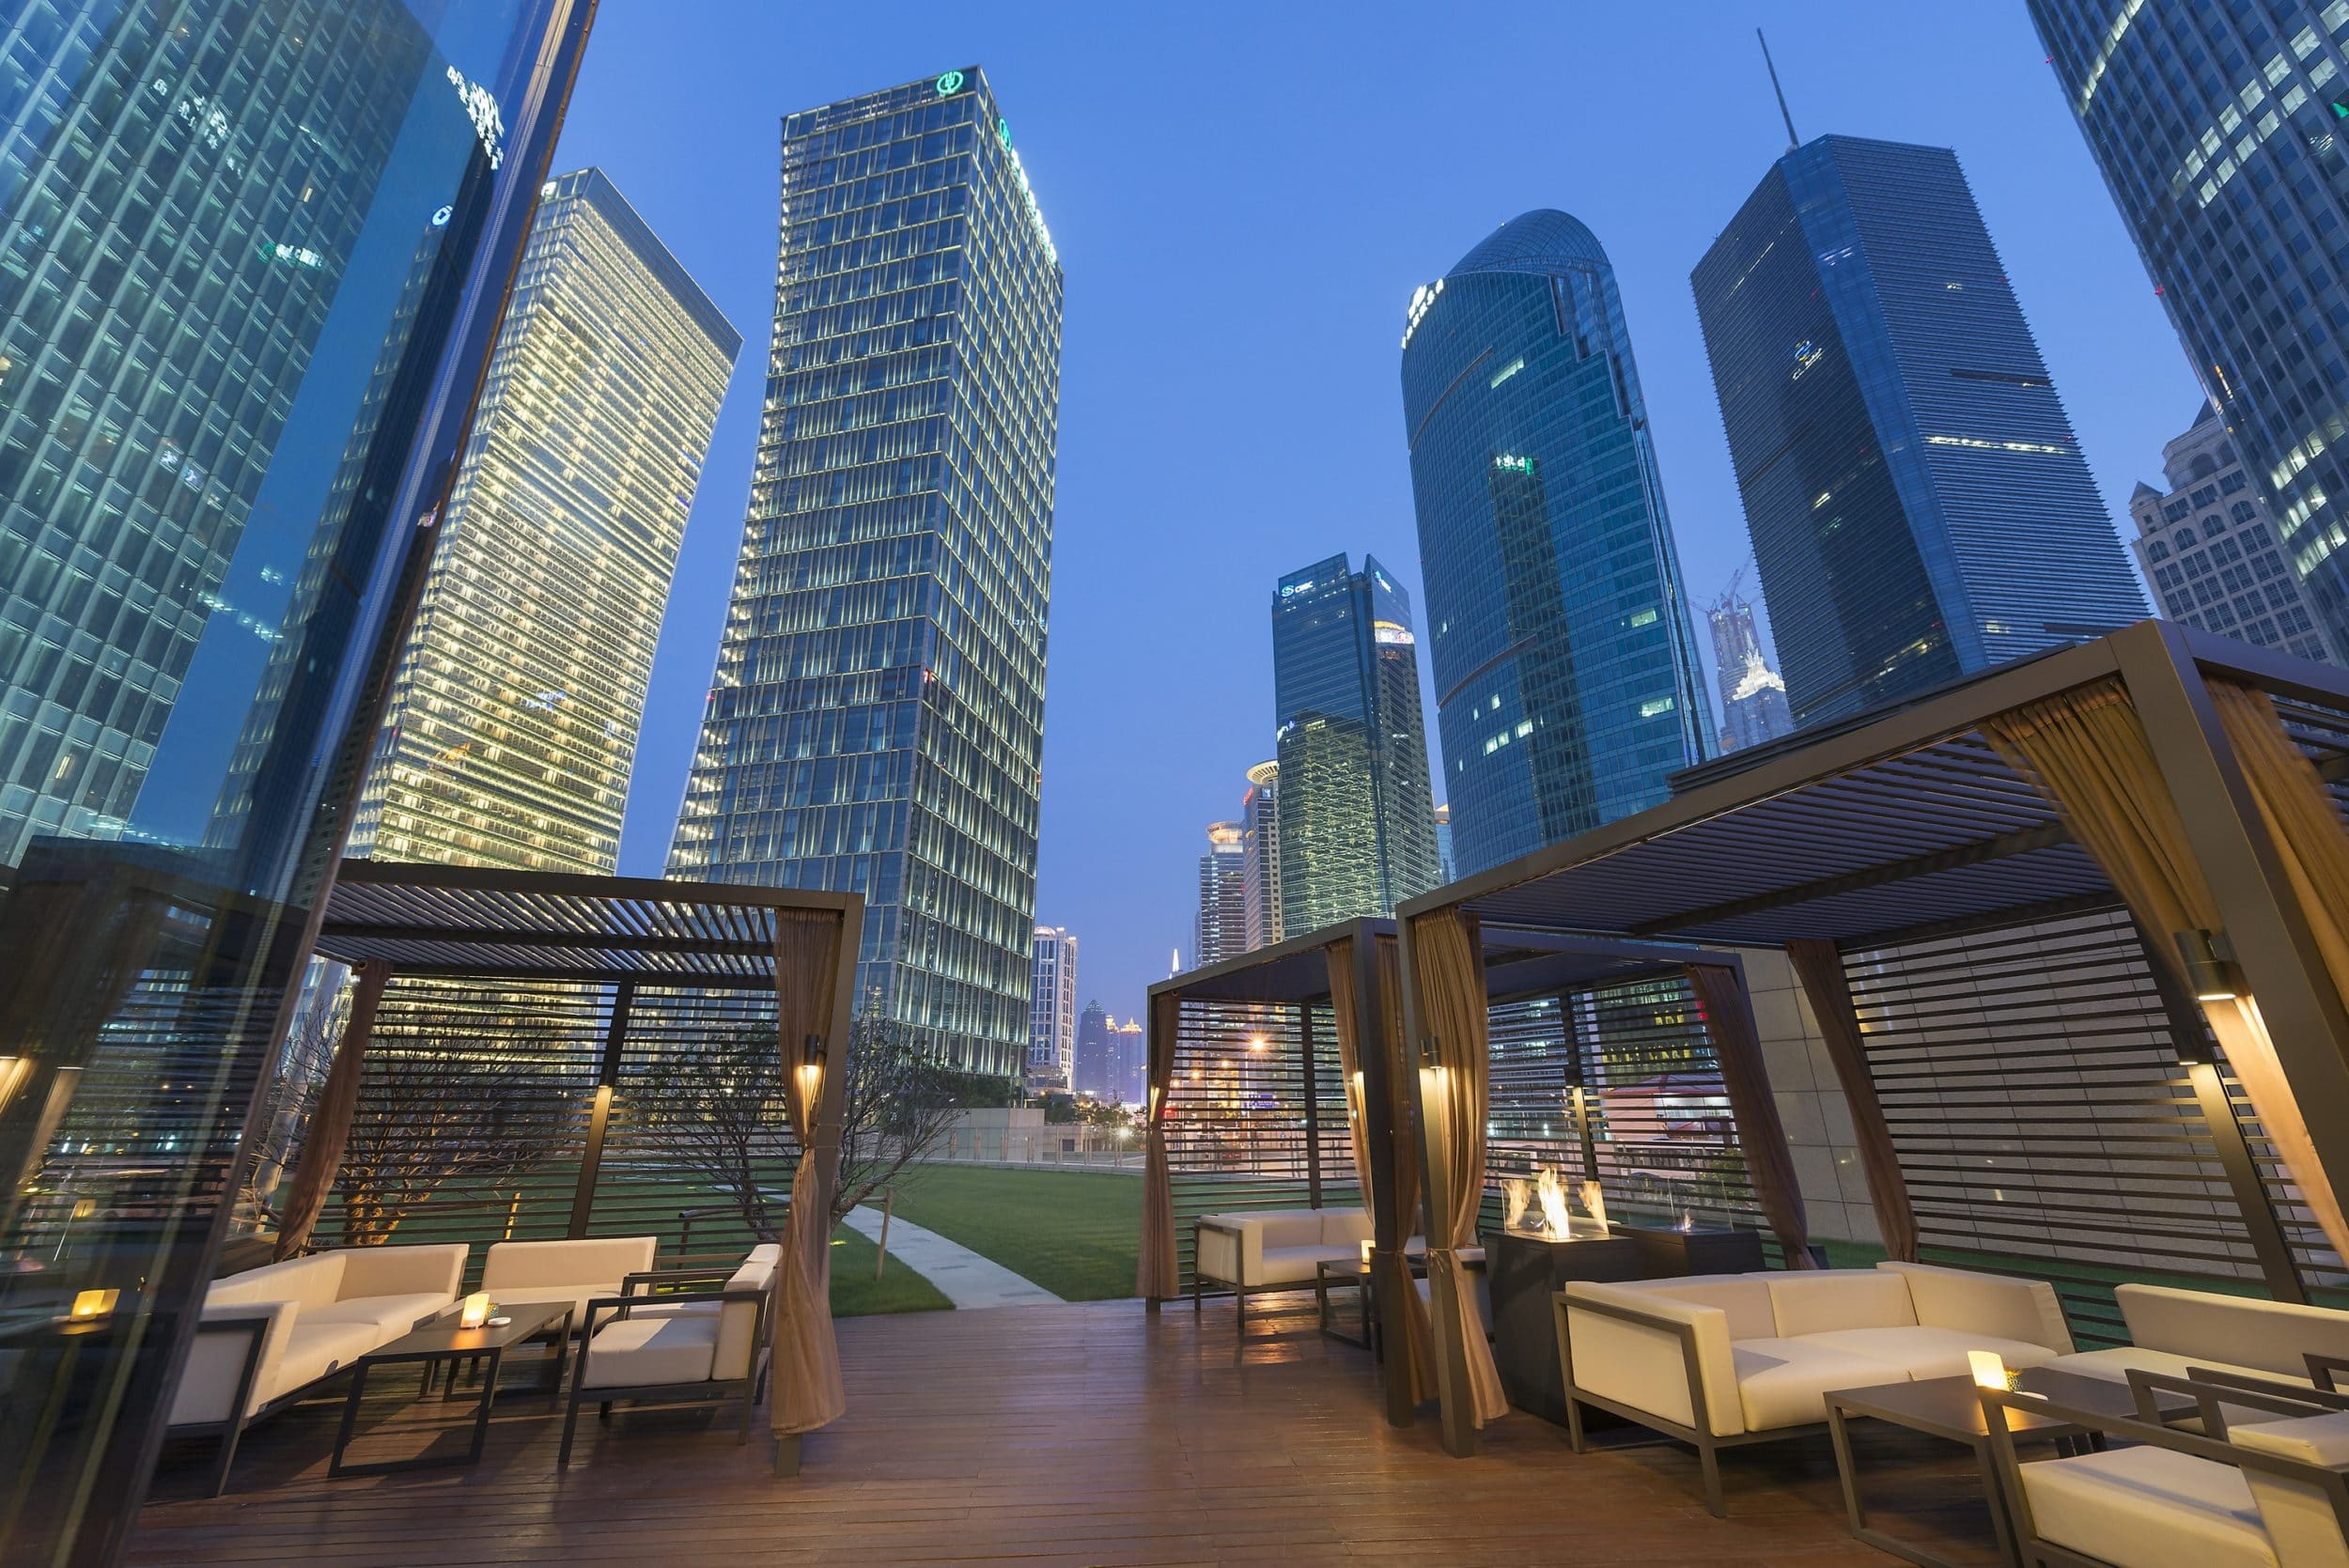 The gorgeous outdoor terrace at Qi Bar, part of Mandarin Oriental Pudong, Shanghai.